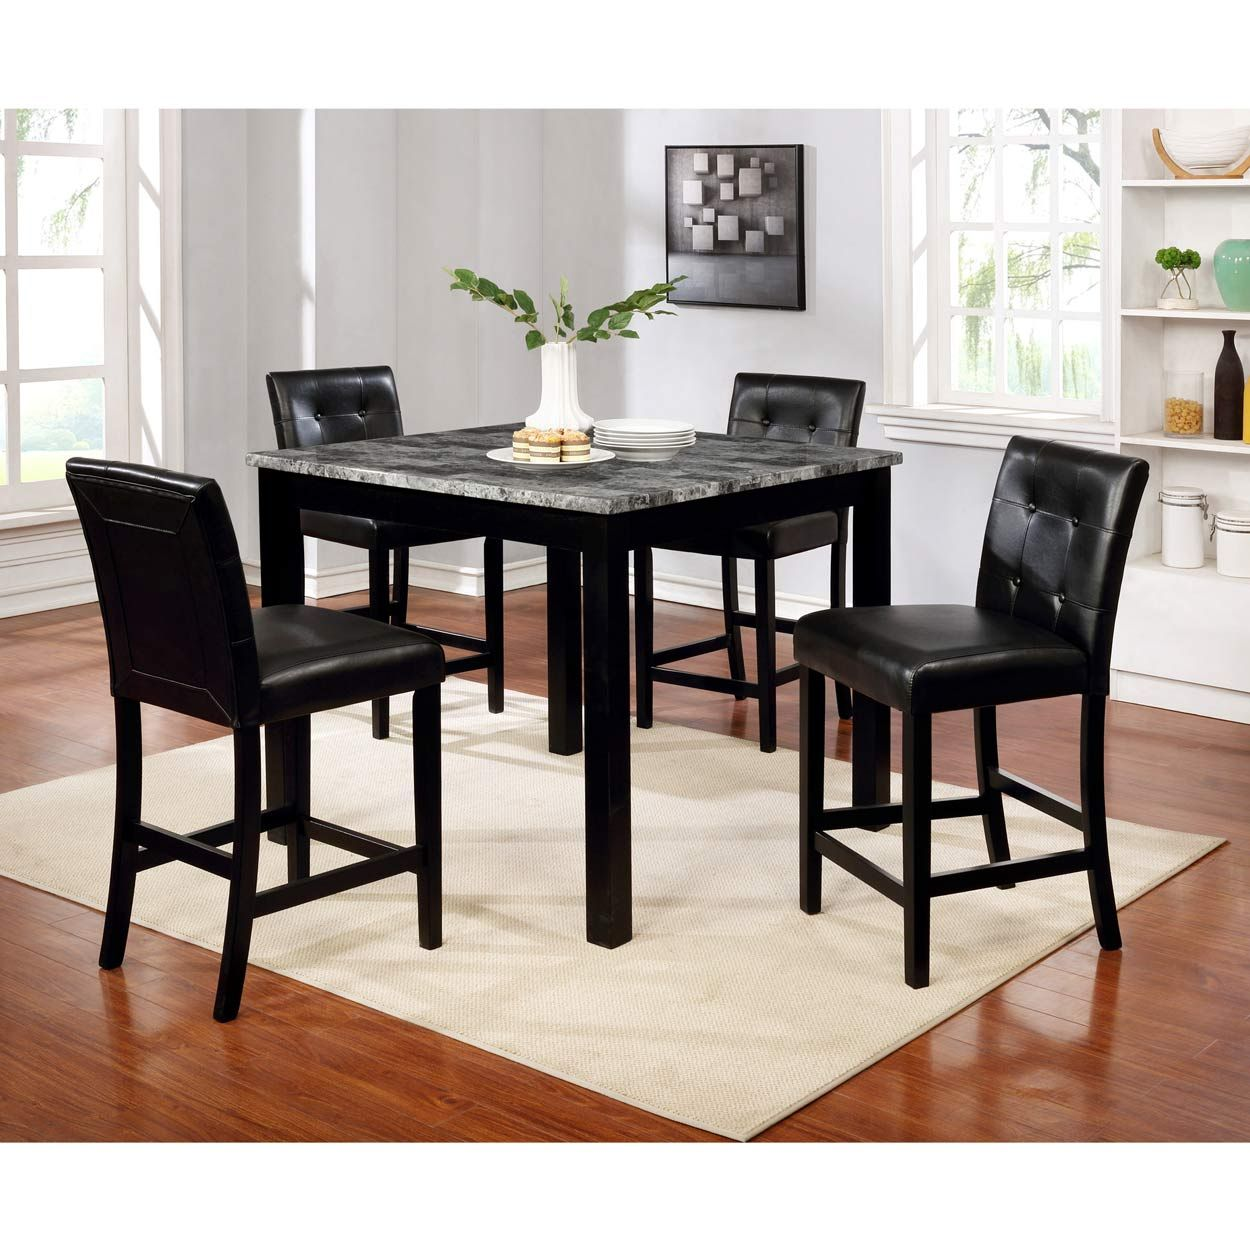 Omaha 9 Piece Counter Height Dining Set   Black